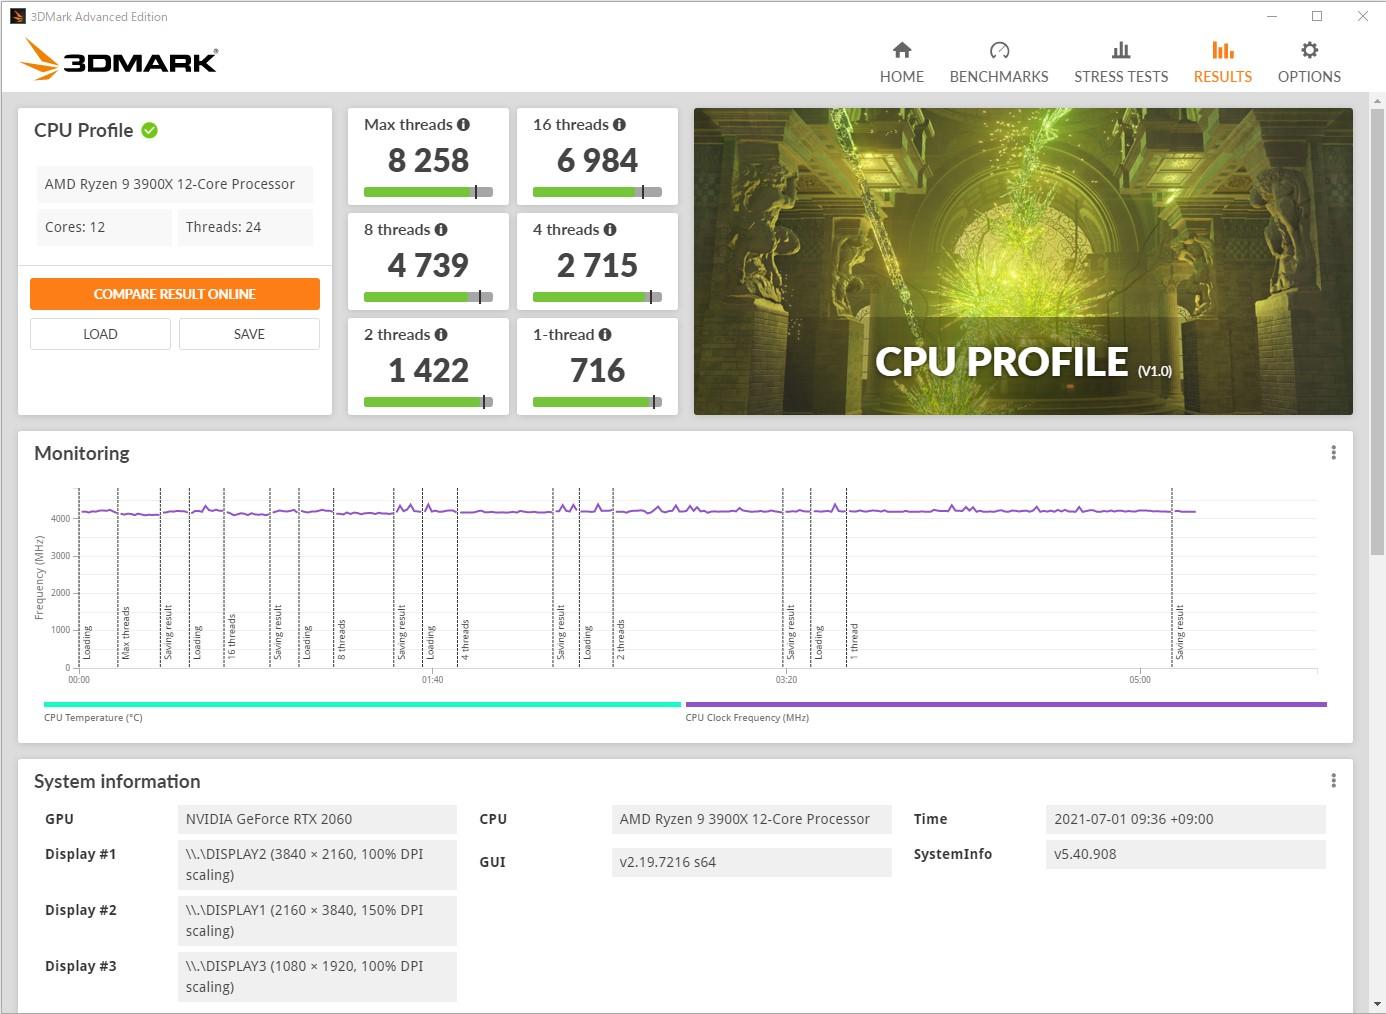 「3DMark CPU Profile」のテスト結果